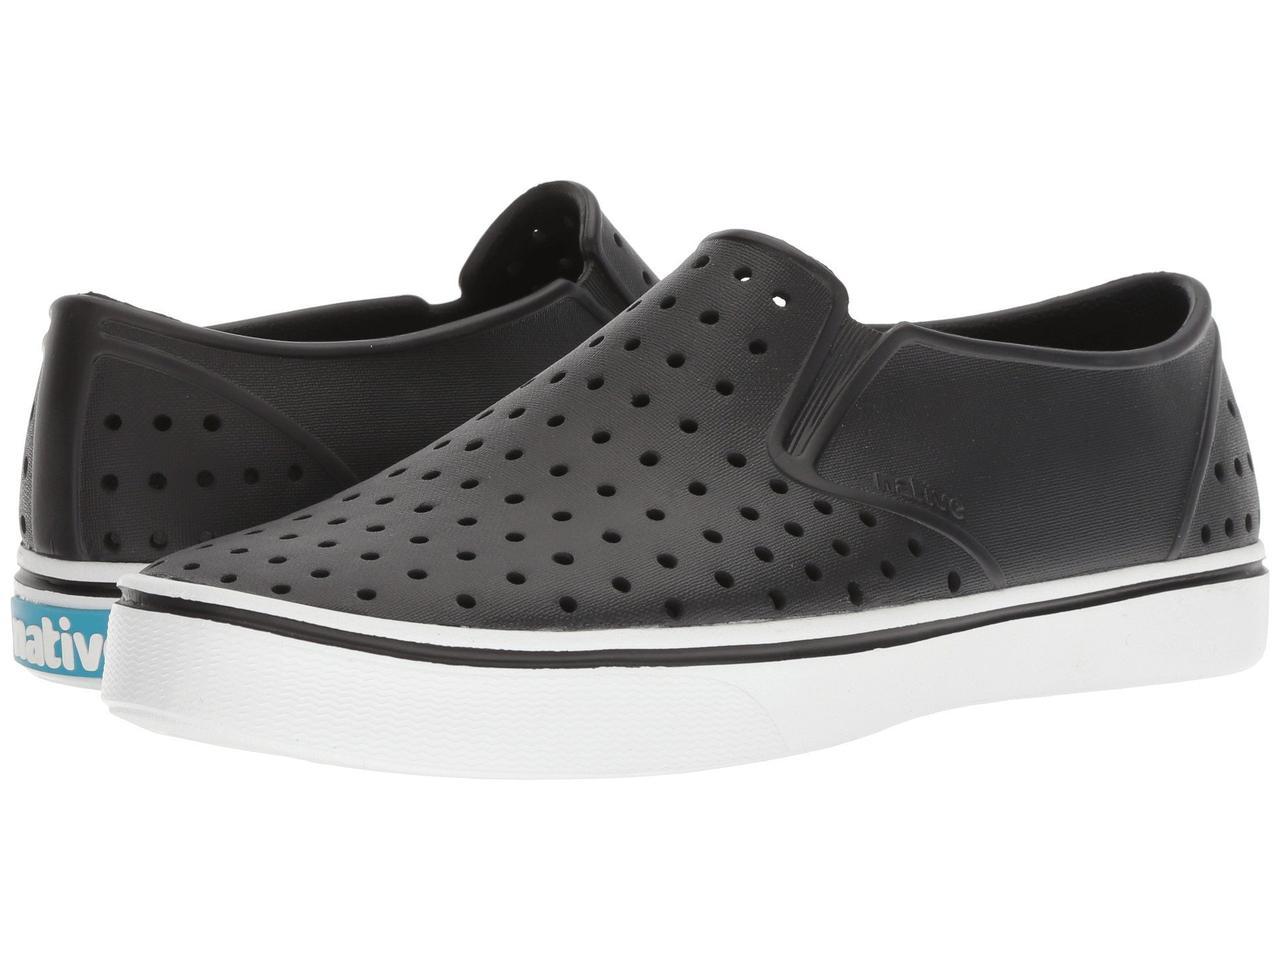 Кроссовки/Кеды (Оригинал) Native Shoes Miles Jiffy Black/Shell White